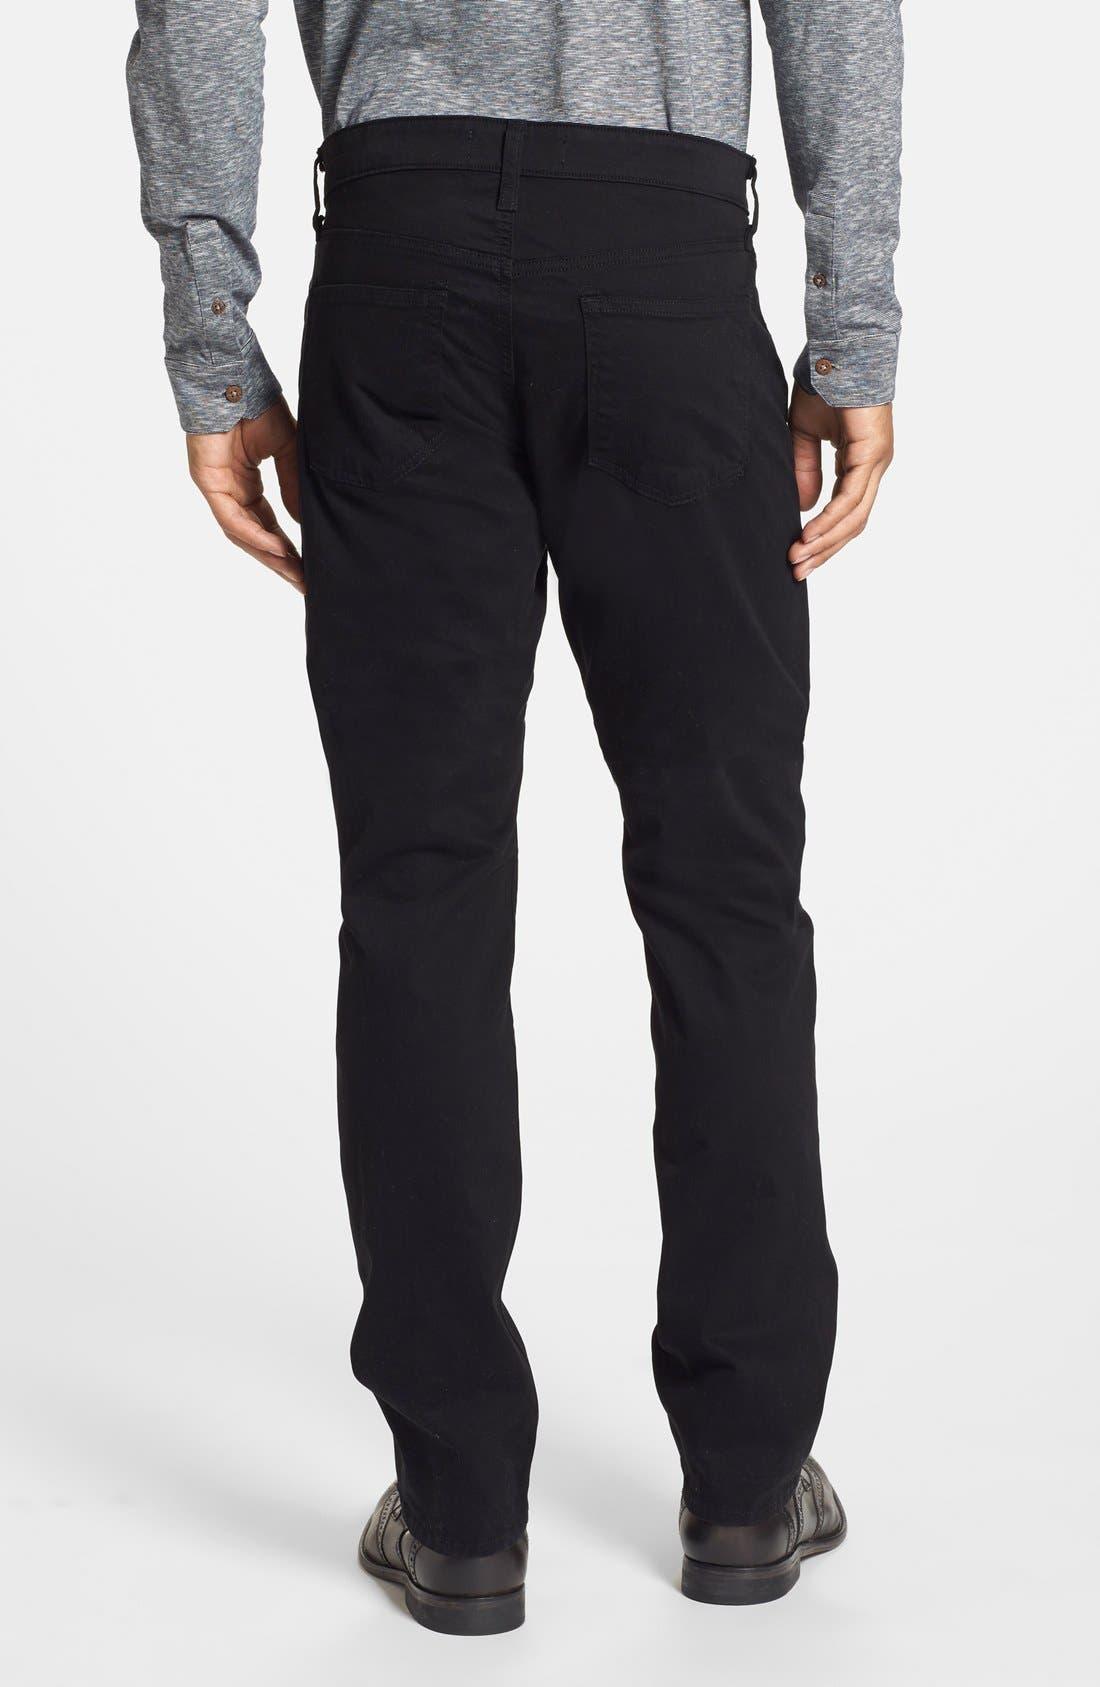 'Kane' Slim Fit Cotton Twill Pants,                             Alternate thumbnail 73, color,